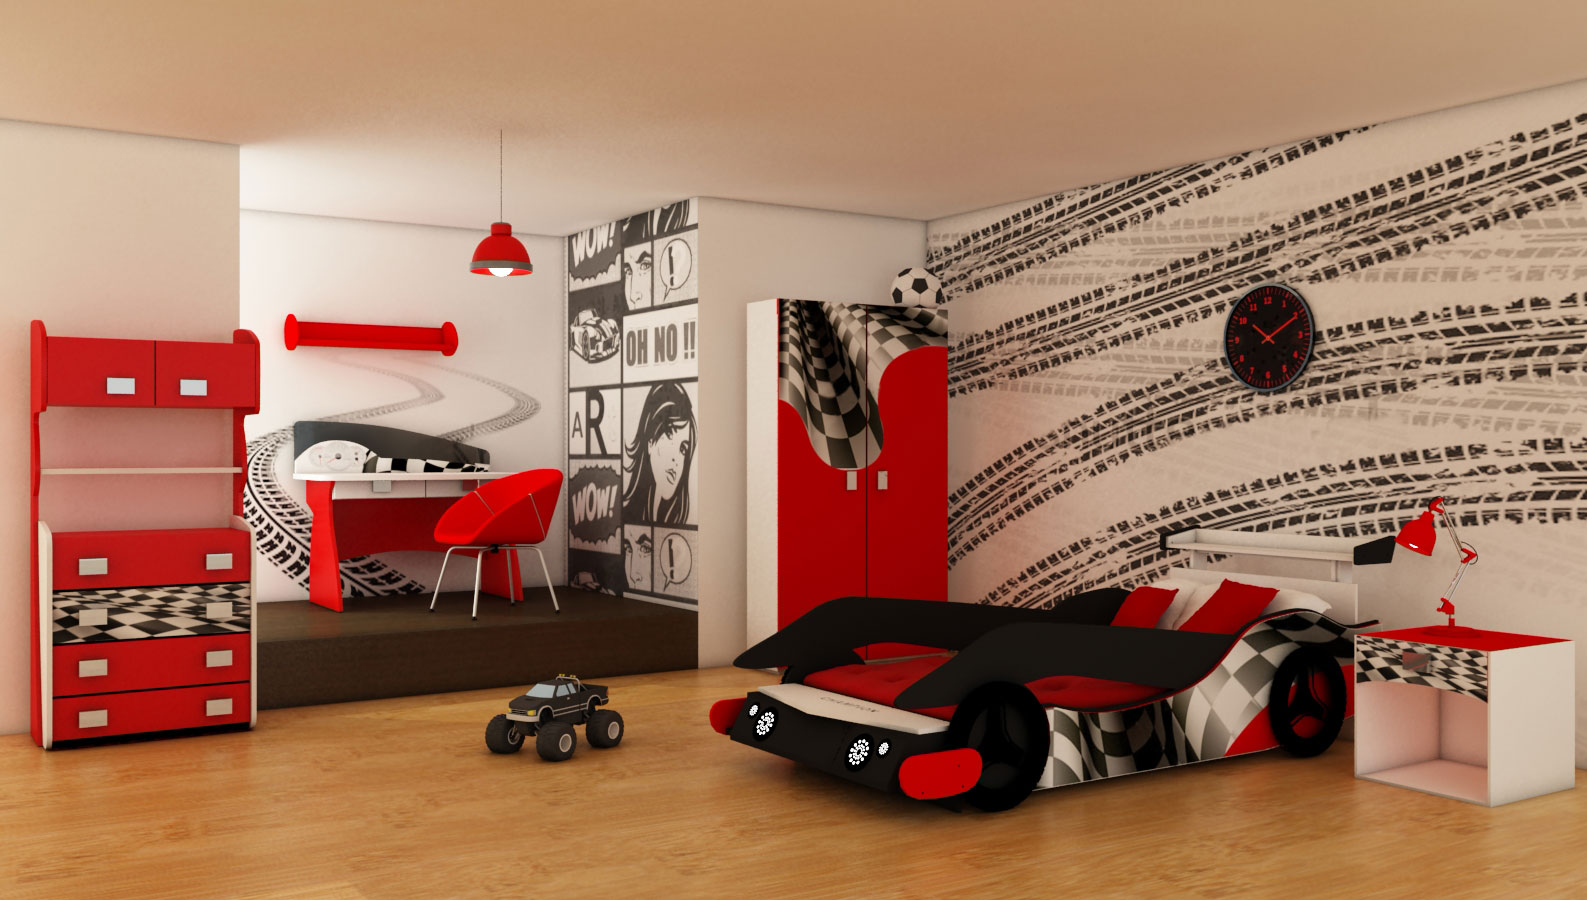 bambinos mobilier d 39 enfant sur mesure au maroc. Black Bedroom Furniture Sets. Home Design Ideas